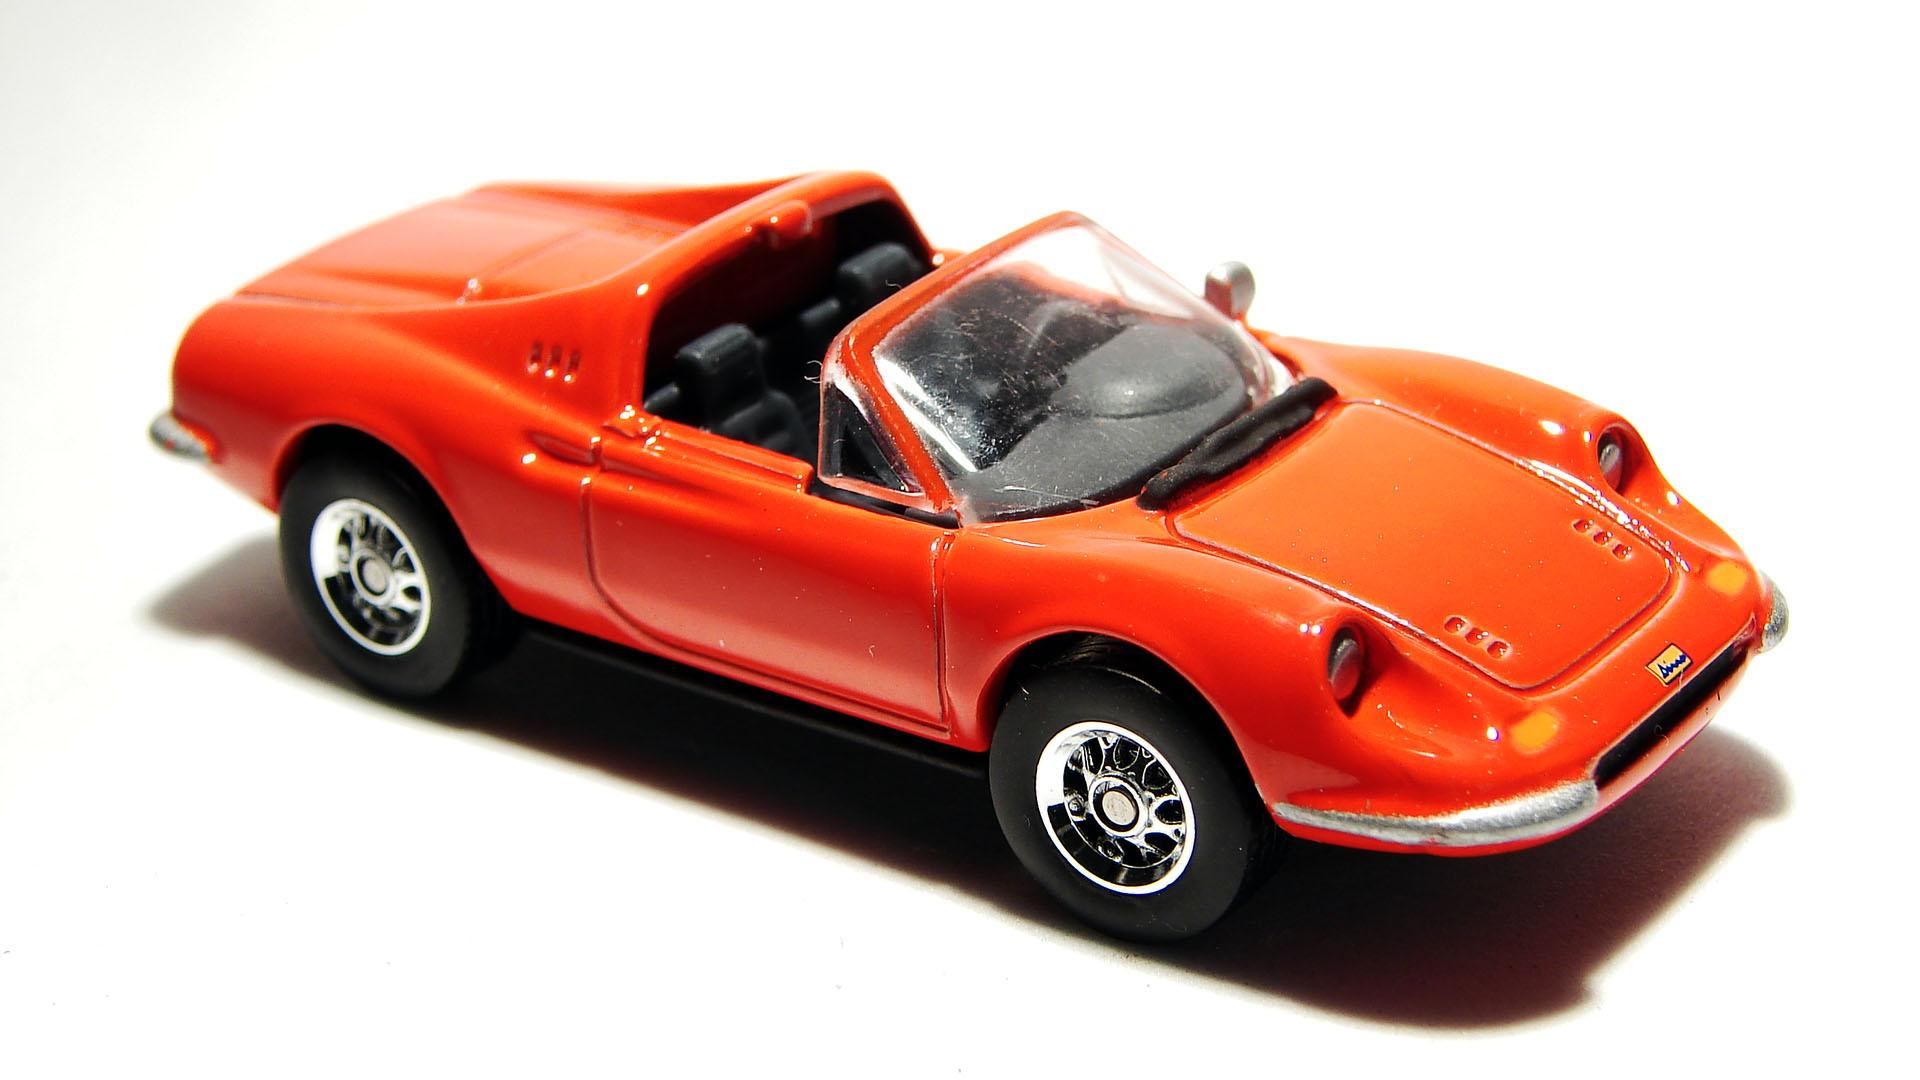 Ferrari Dino 246 Gt Hot Wheels Wiki Fandom